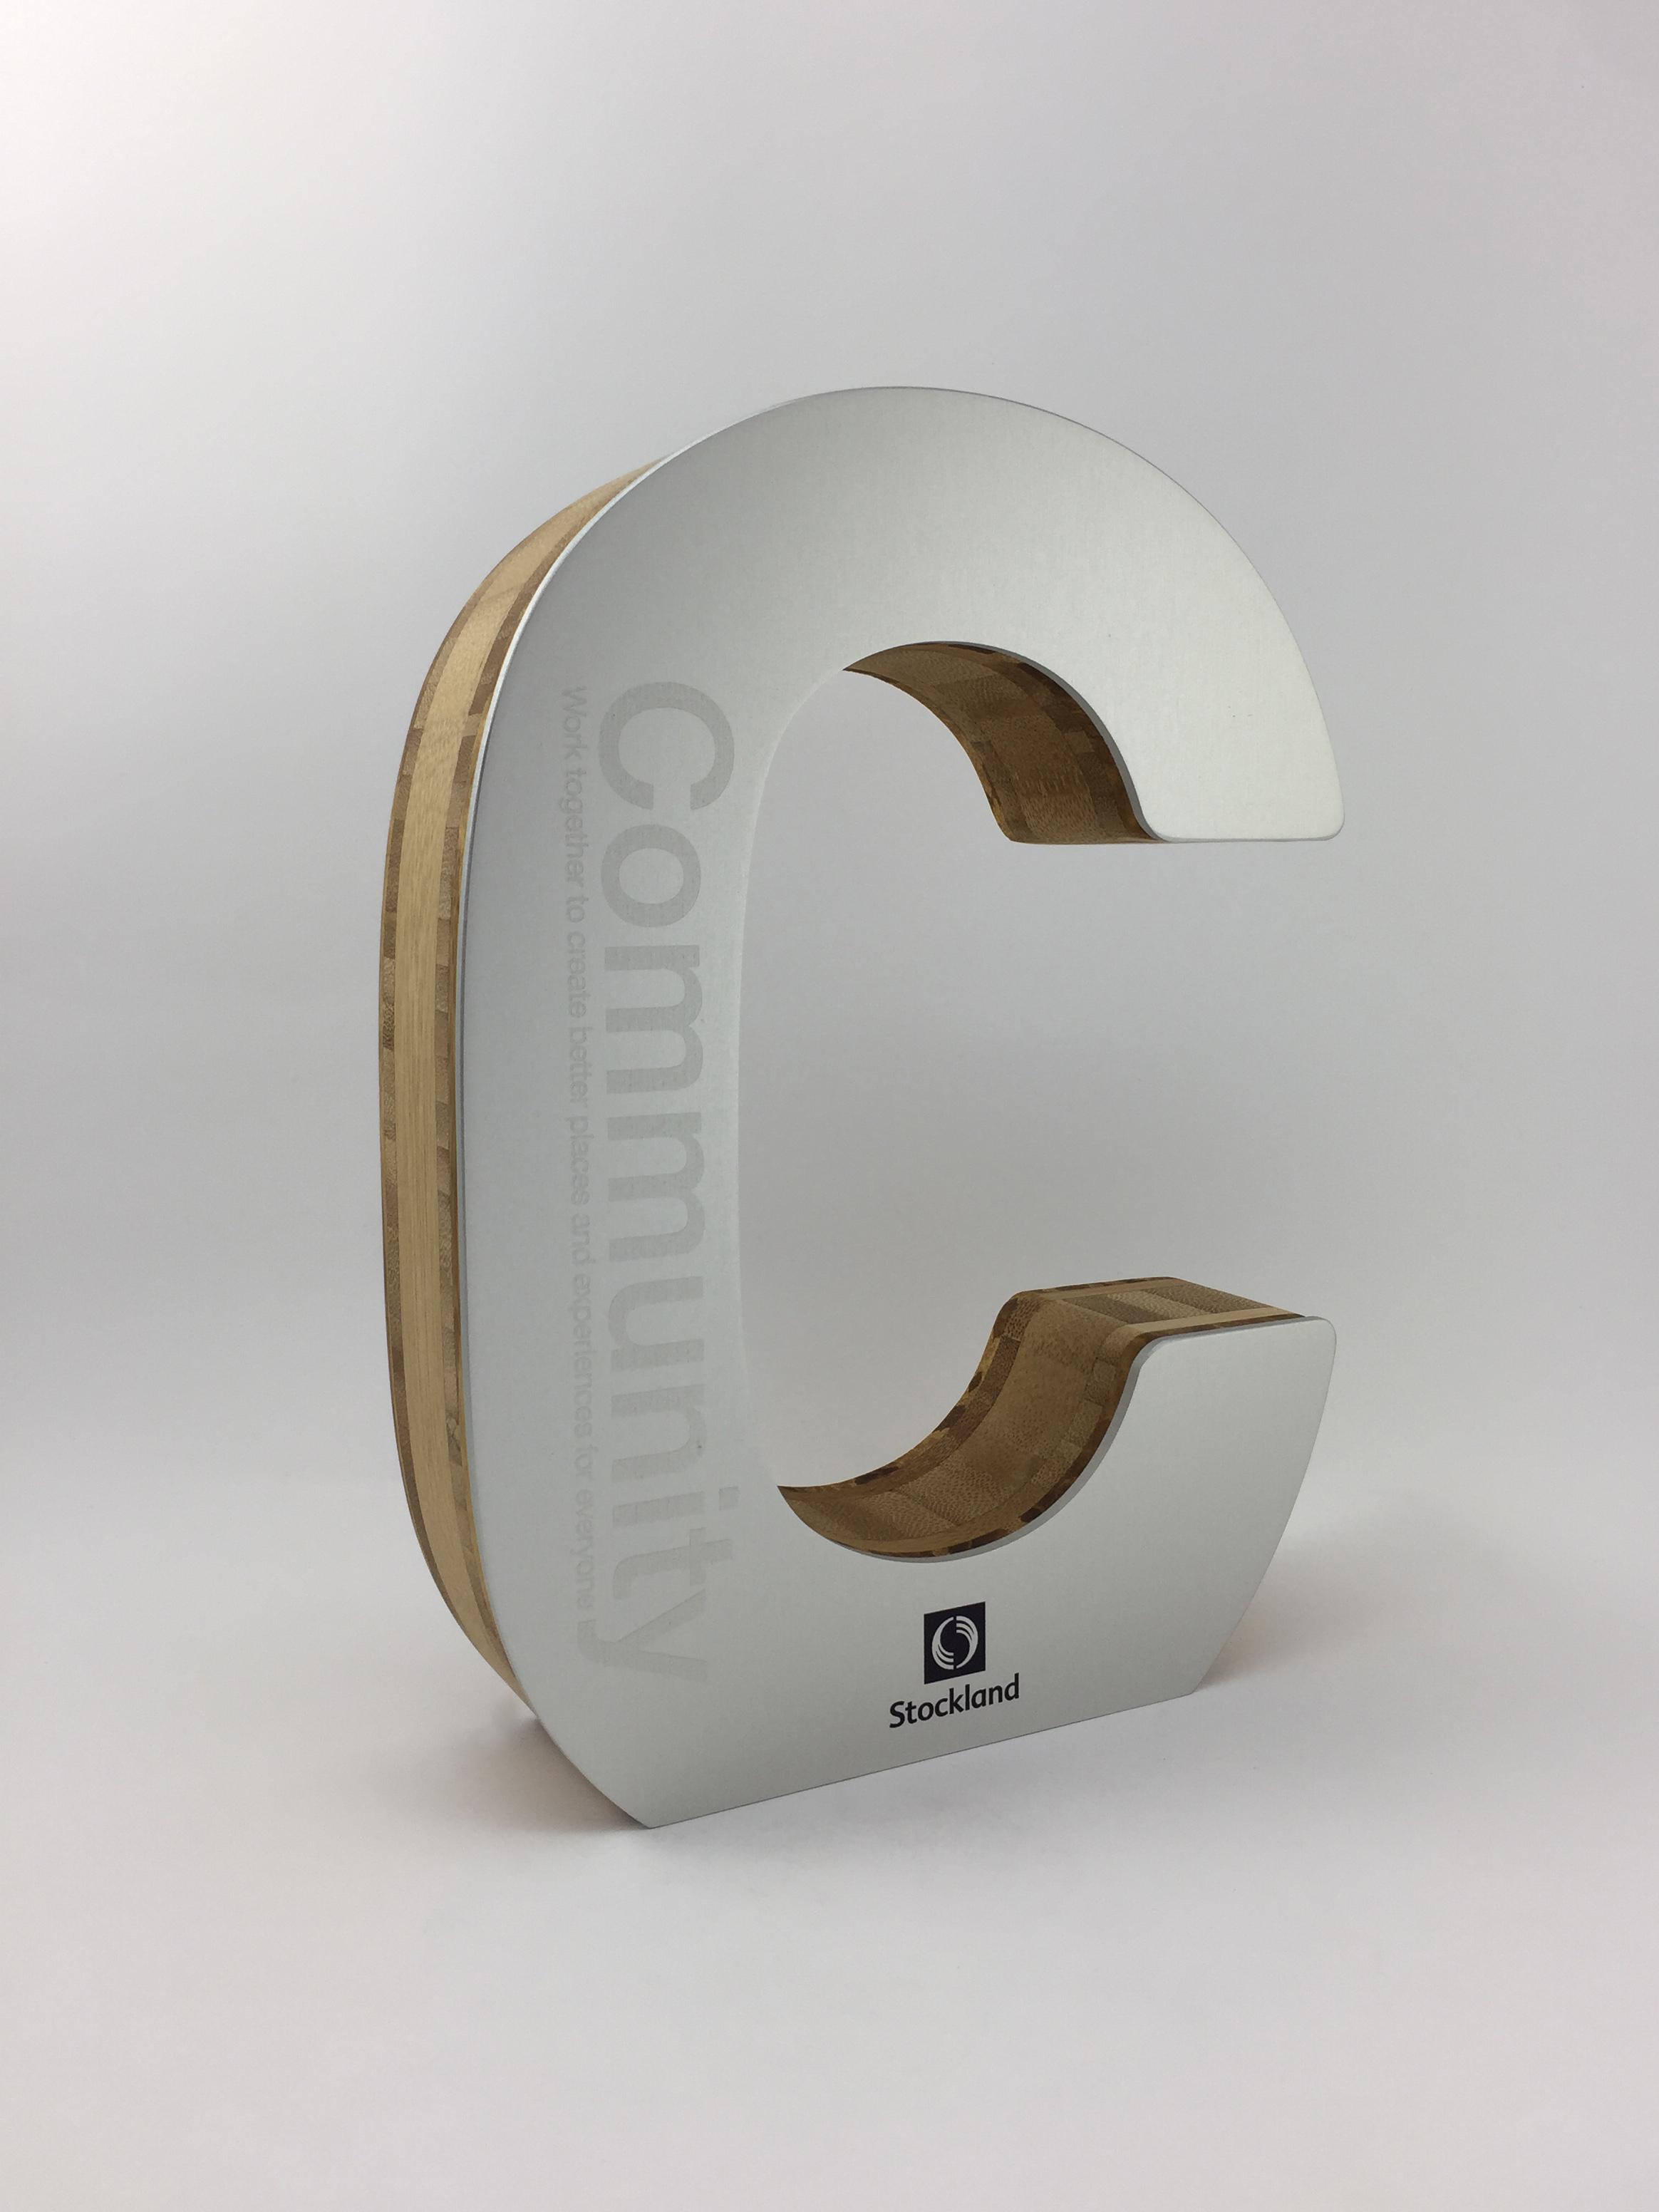 stockland-care-awards-eco-bamboo-plywood-timber-aluminium-trophy-02.jpg